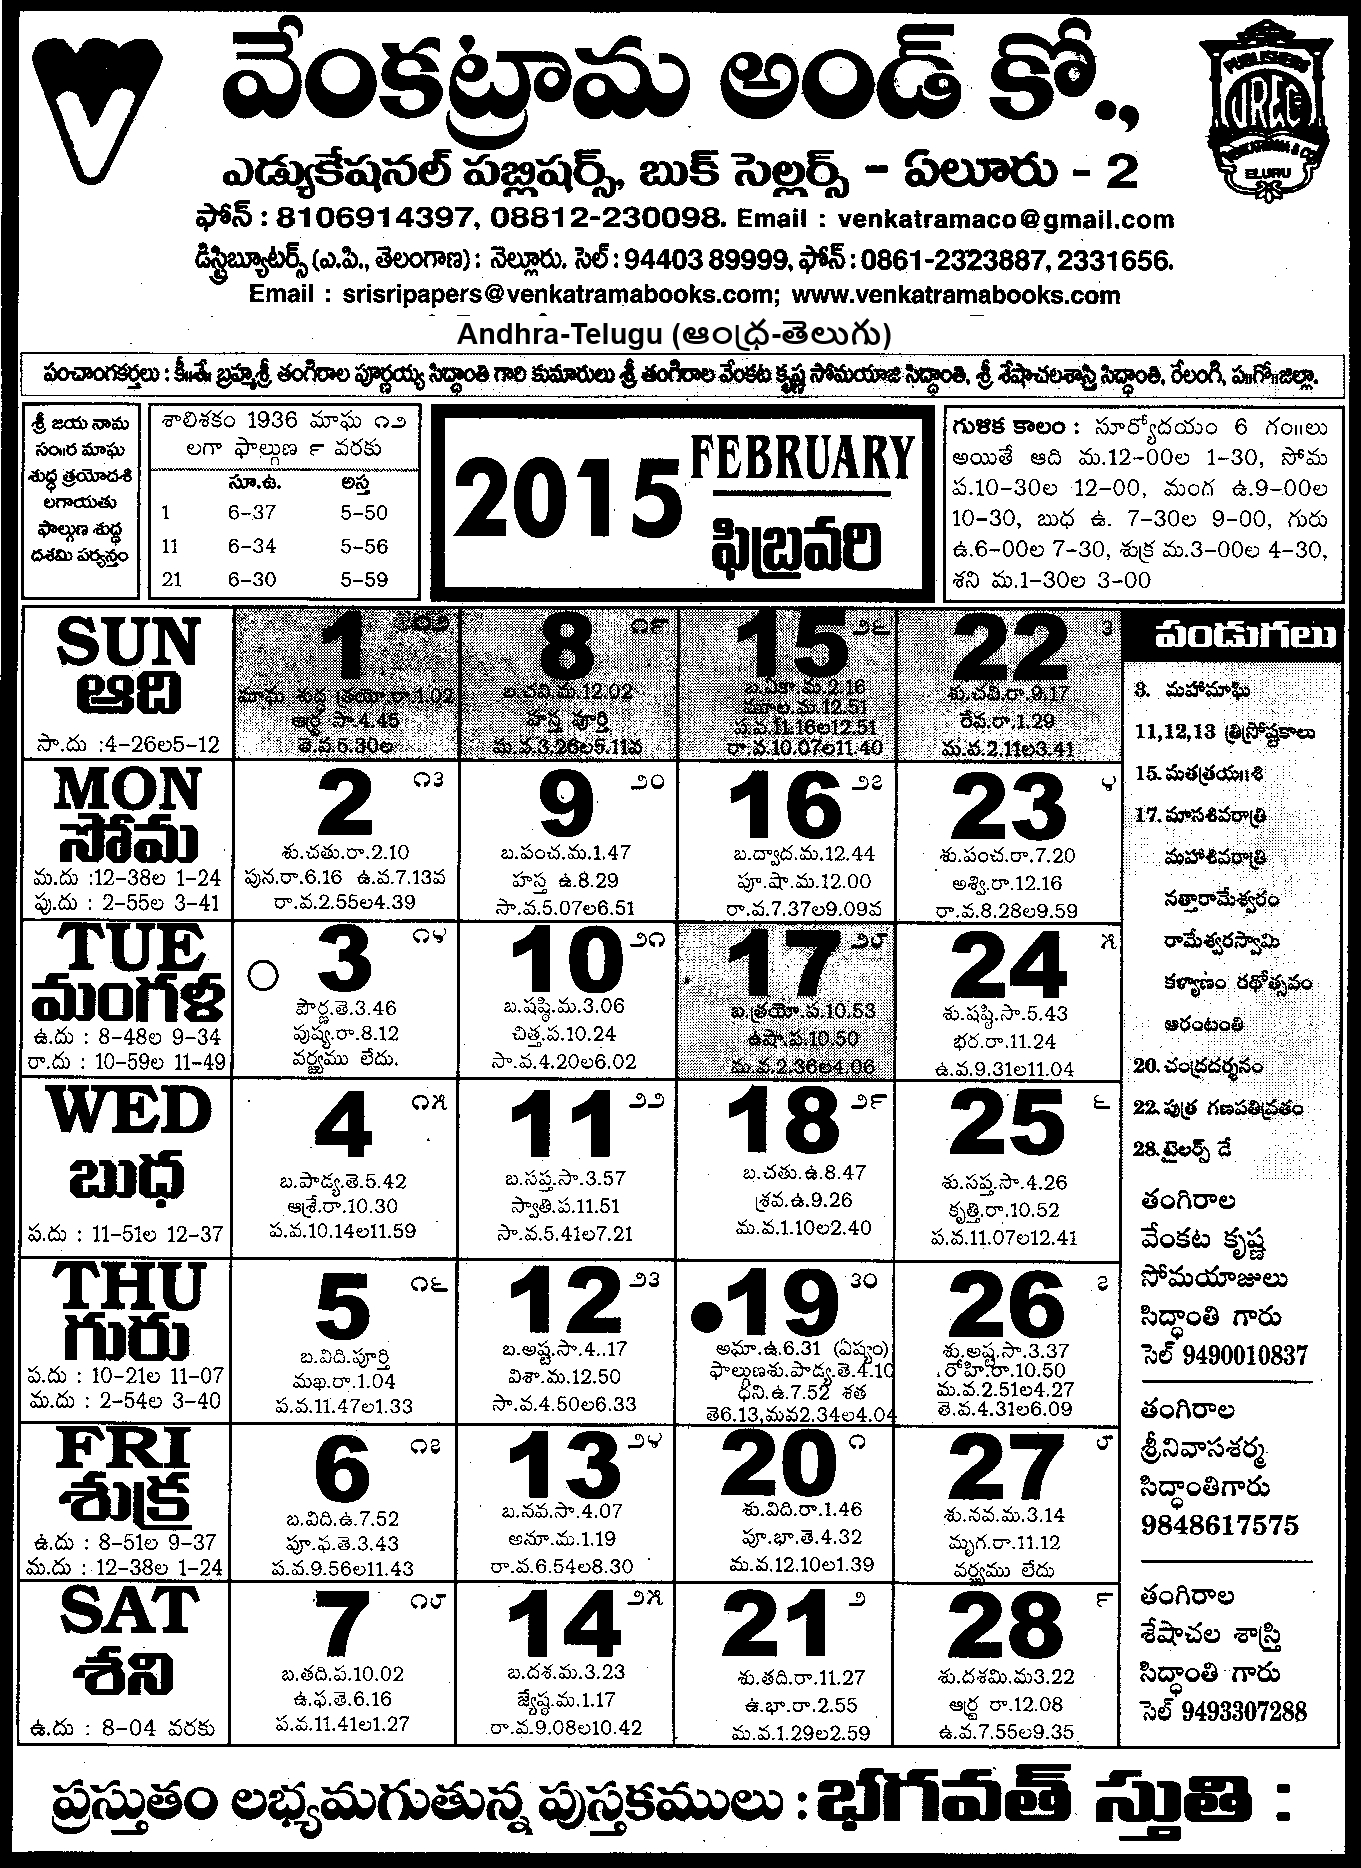 ... with the latest Venkatrama and Co Telugu Calendar 2015 calendar